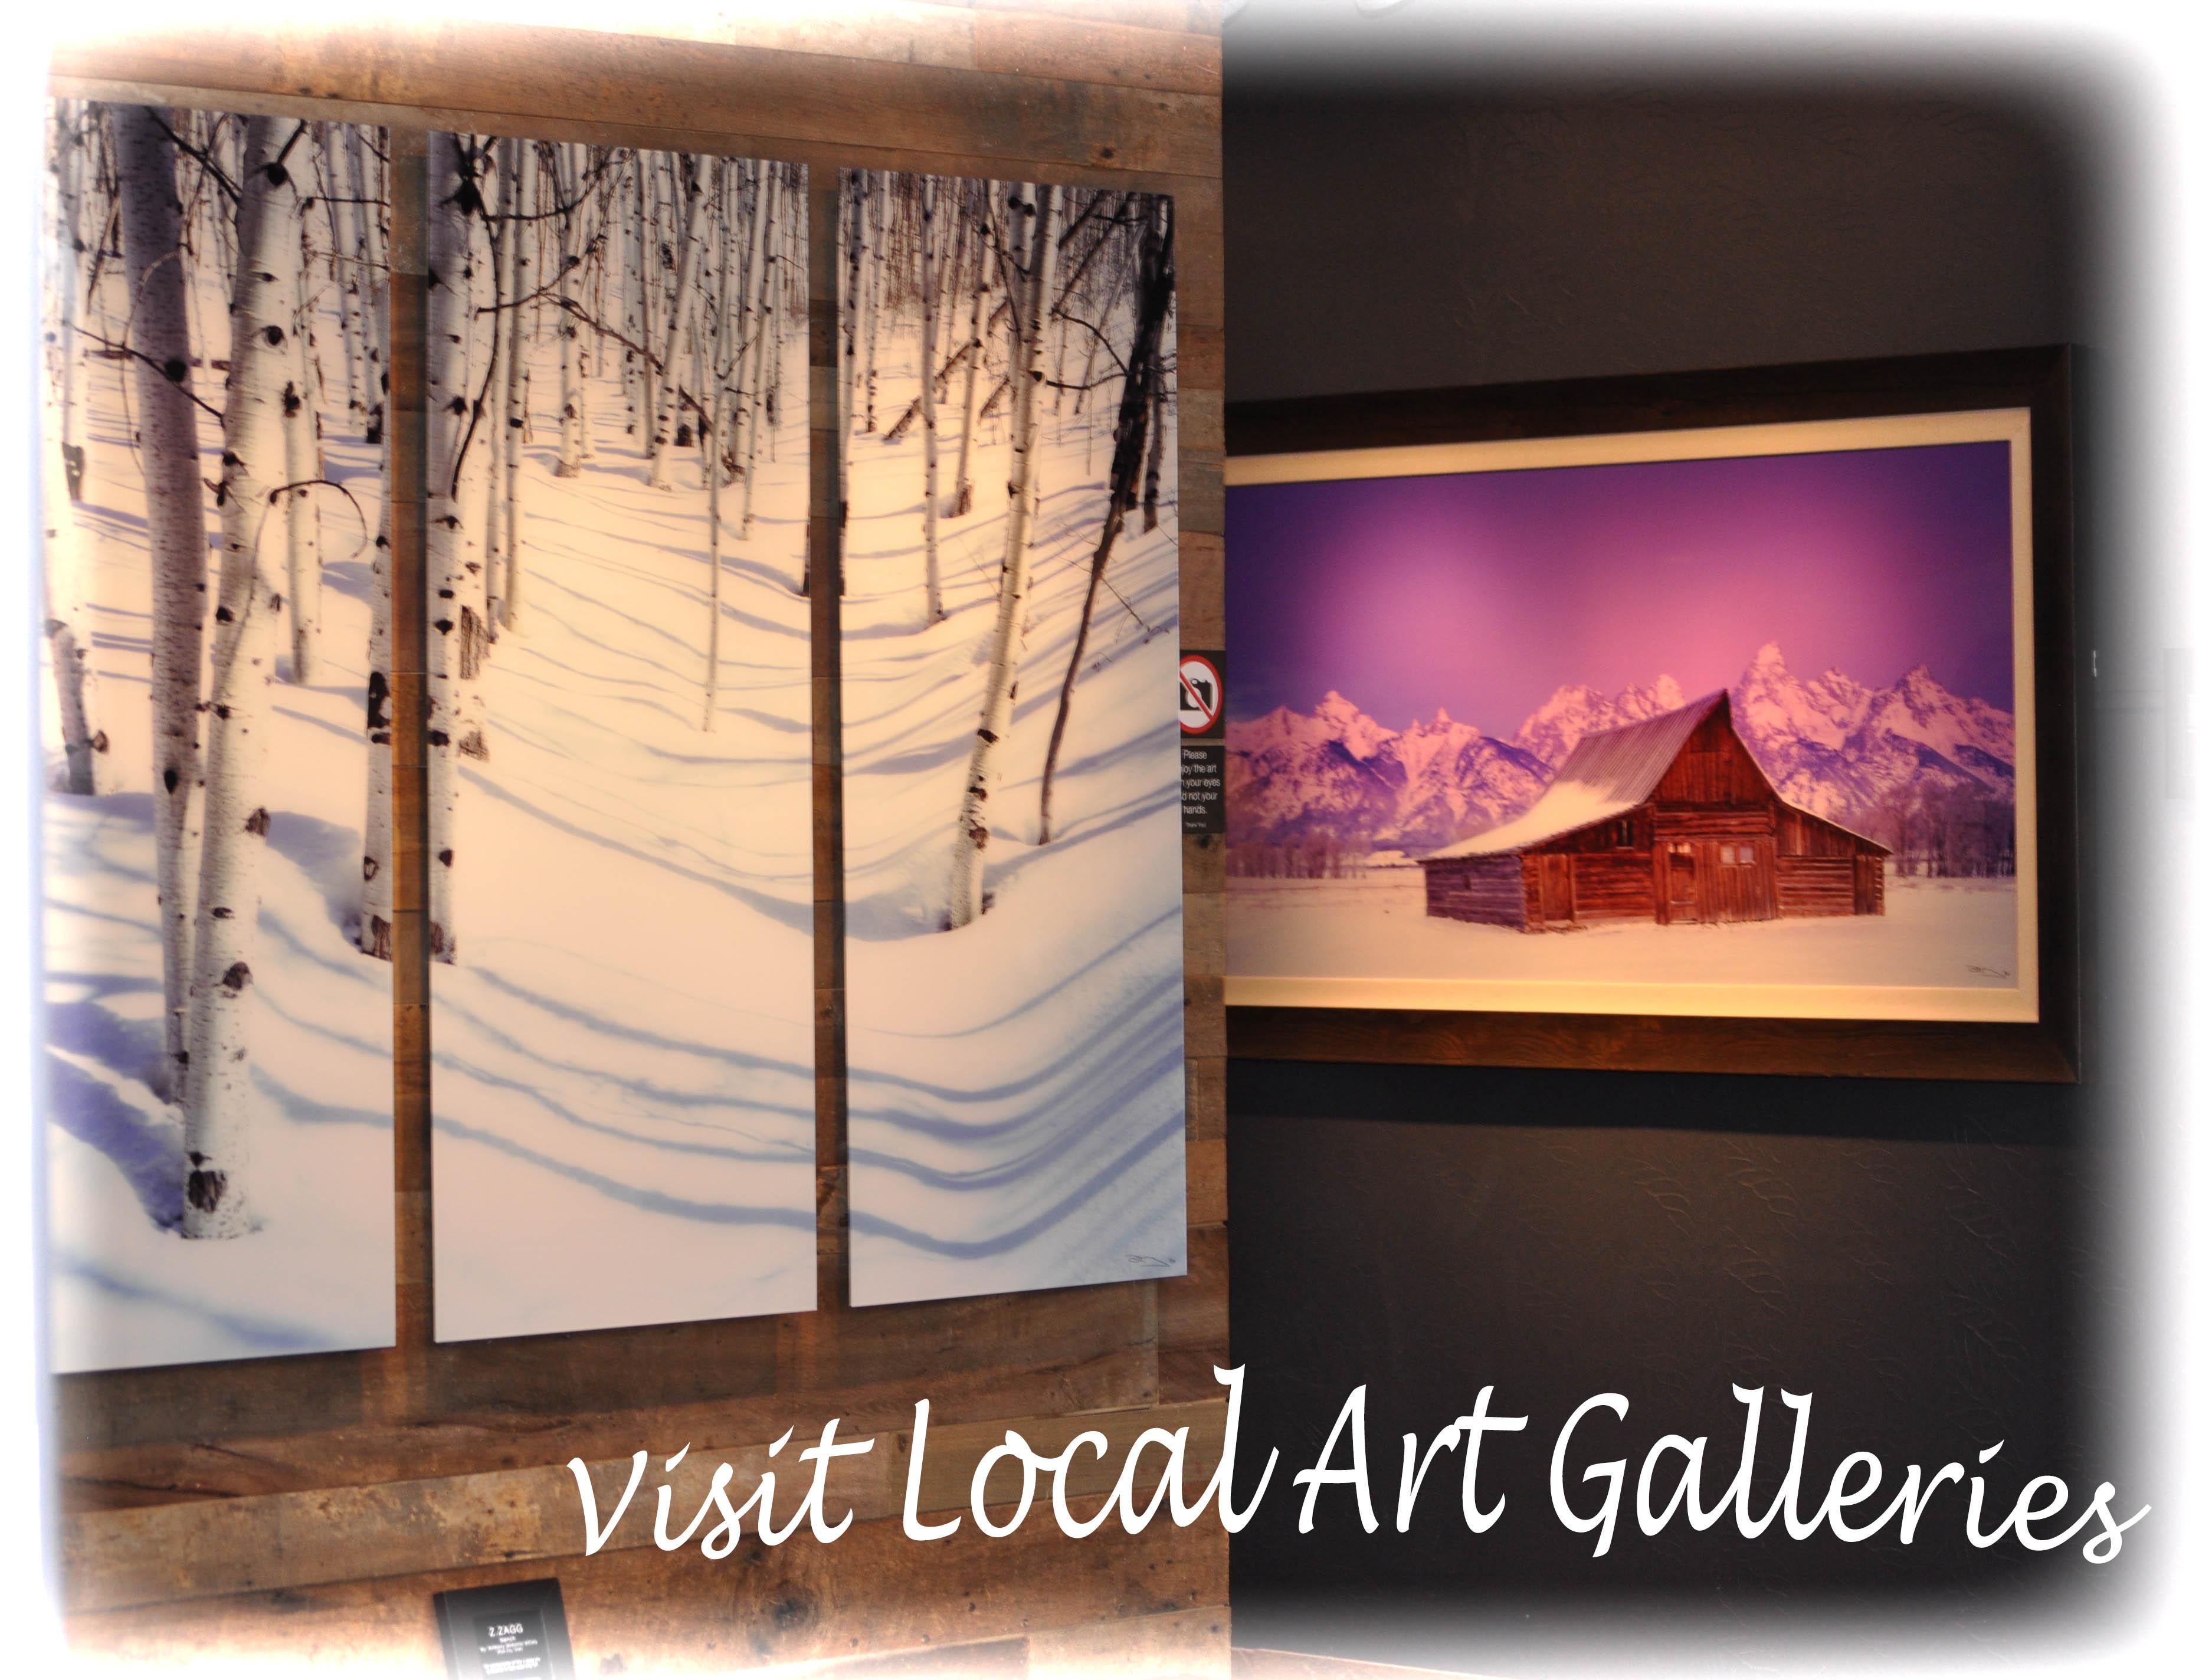 FOTS-Art Galleries on Main